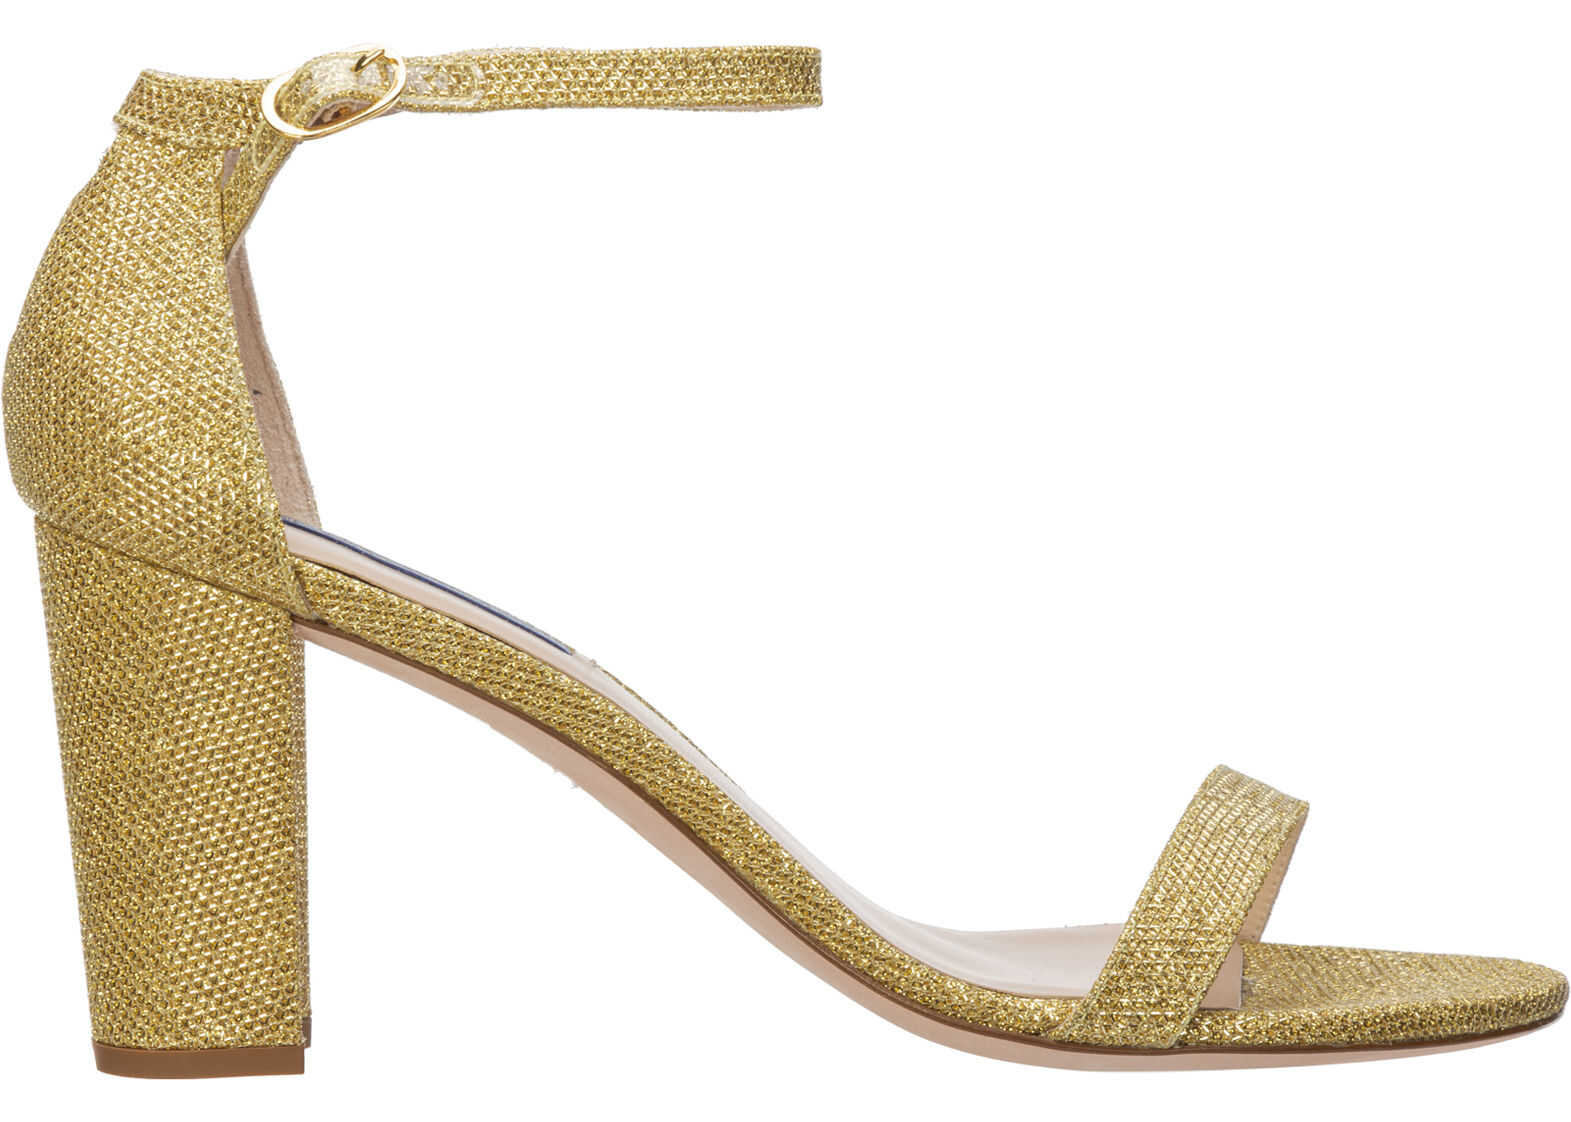 Stuart Weitzman Sandals Nearlynude Gold